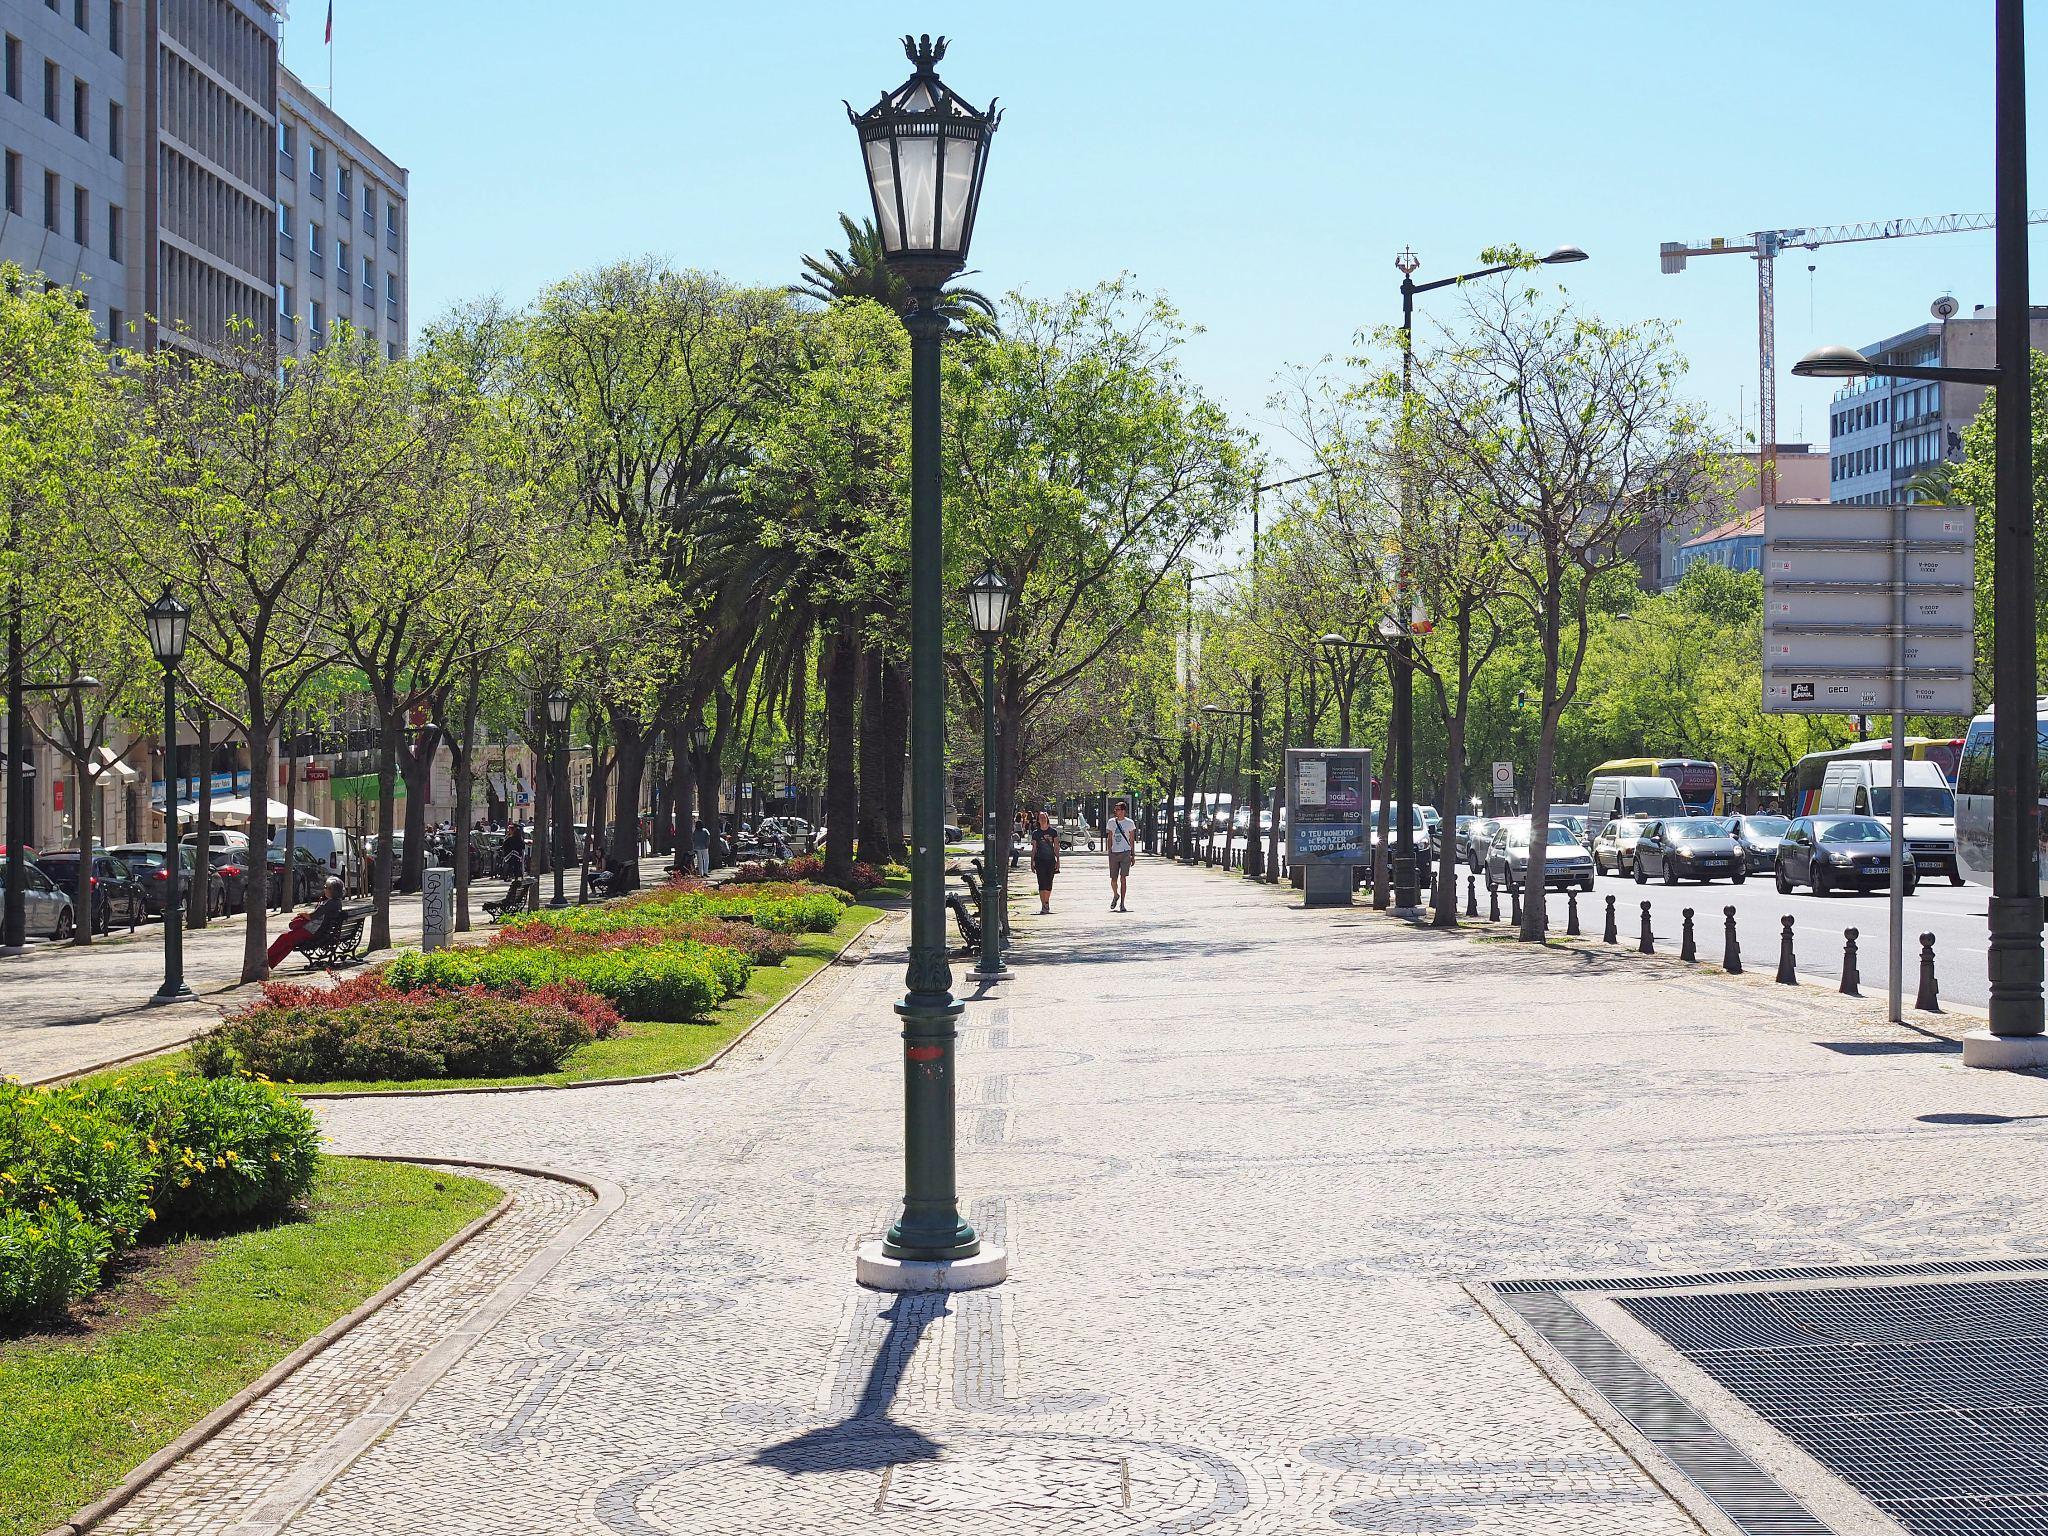 Green City, Lisbon